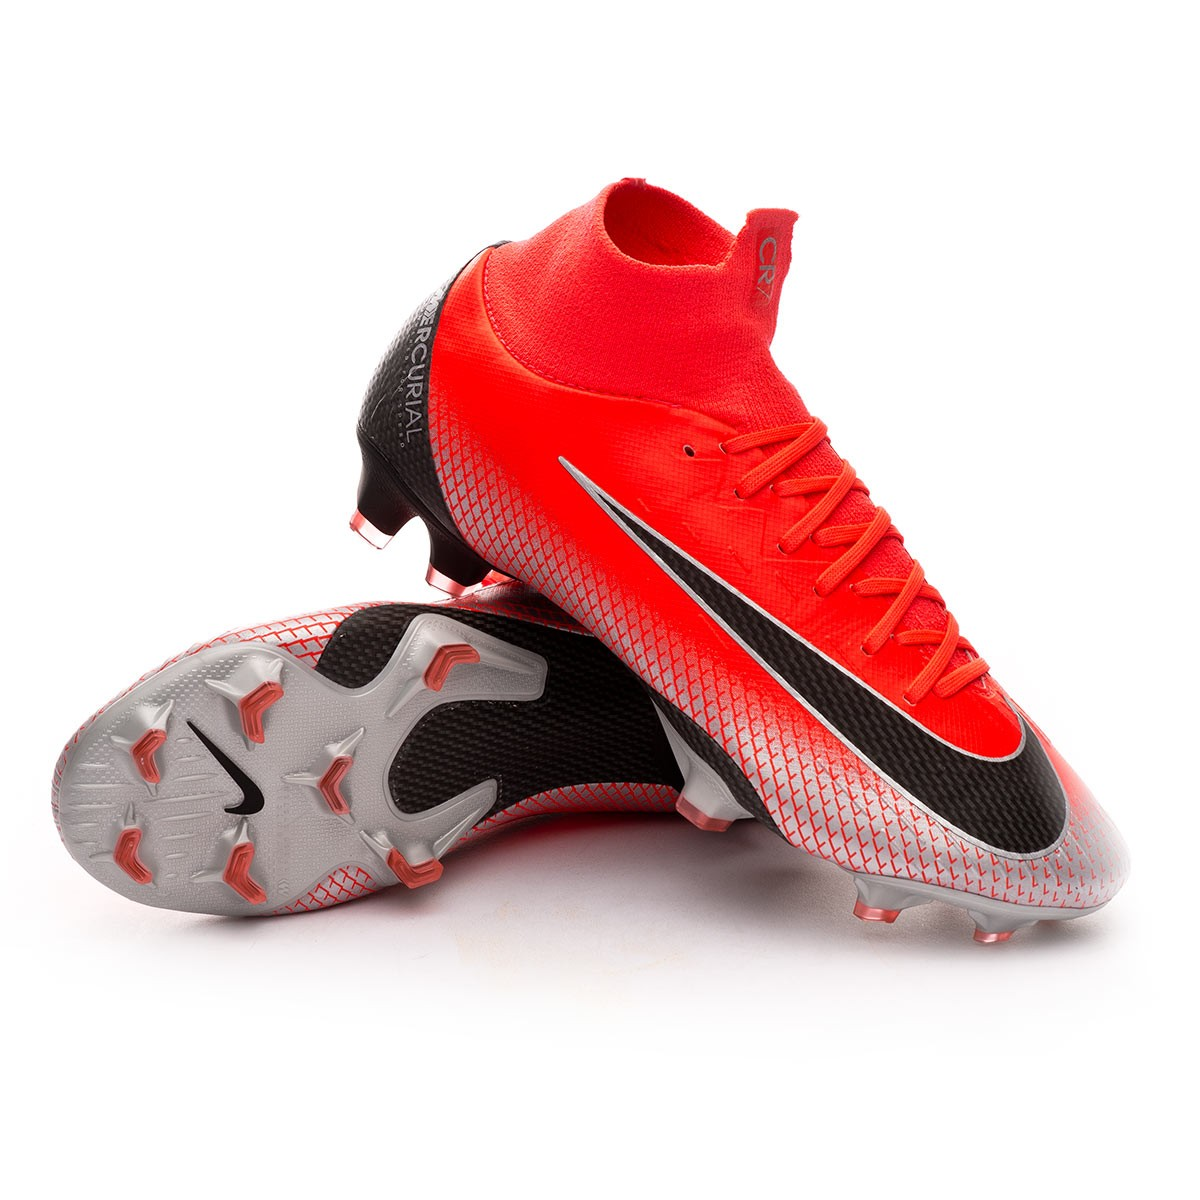 new concept 2f2a3 5f045 Zapatos de fútbol Nike Mercurial Superfly VI Pro CR7 FG Bright crimson-Black-Chrome-Dark  grey - Soloporteros es ahora Fútbol Emotion